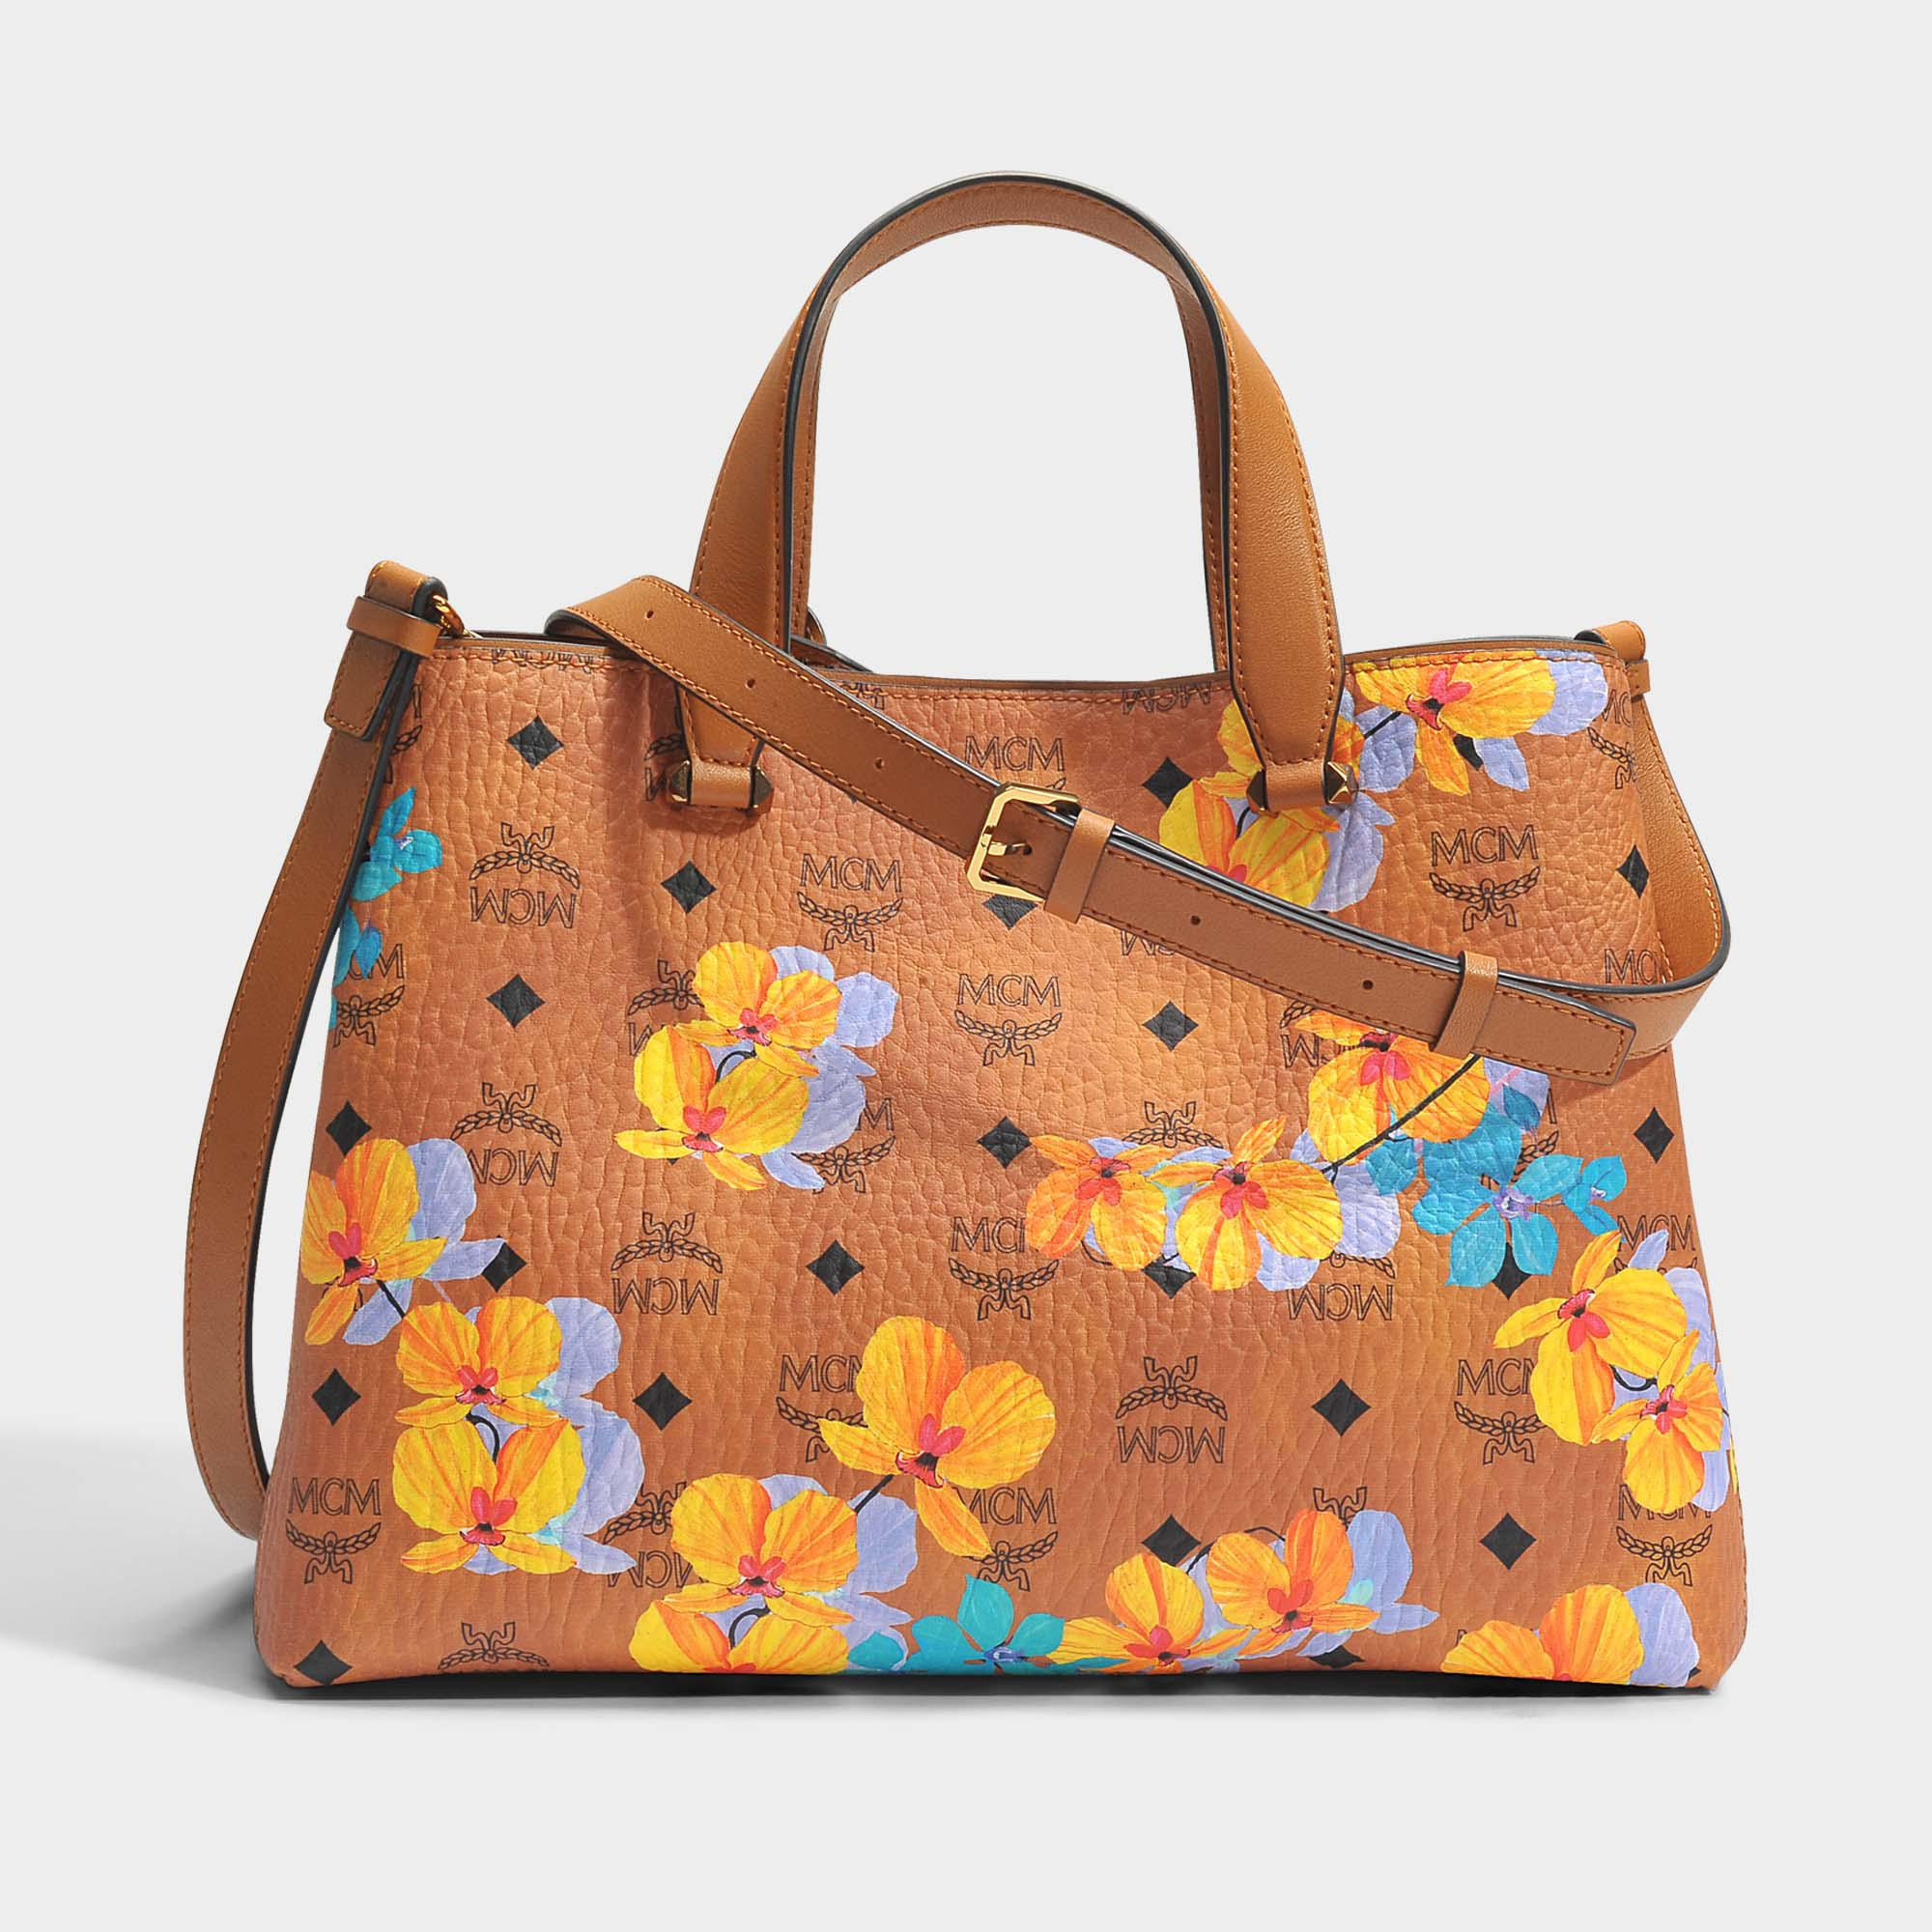 Mcm Fleur Sac Shopping Moyen En Coton Enduit De Cognac DKVlV